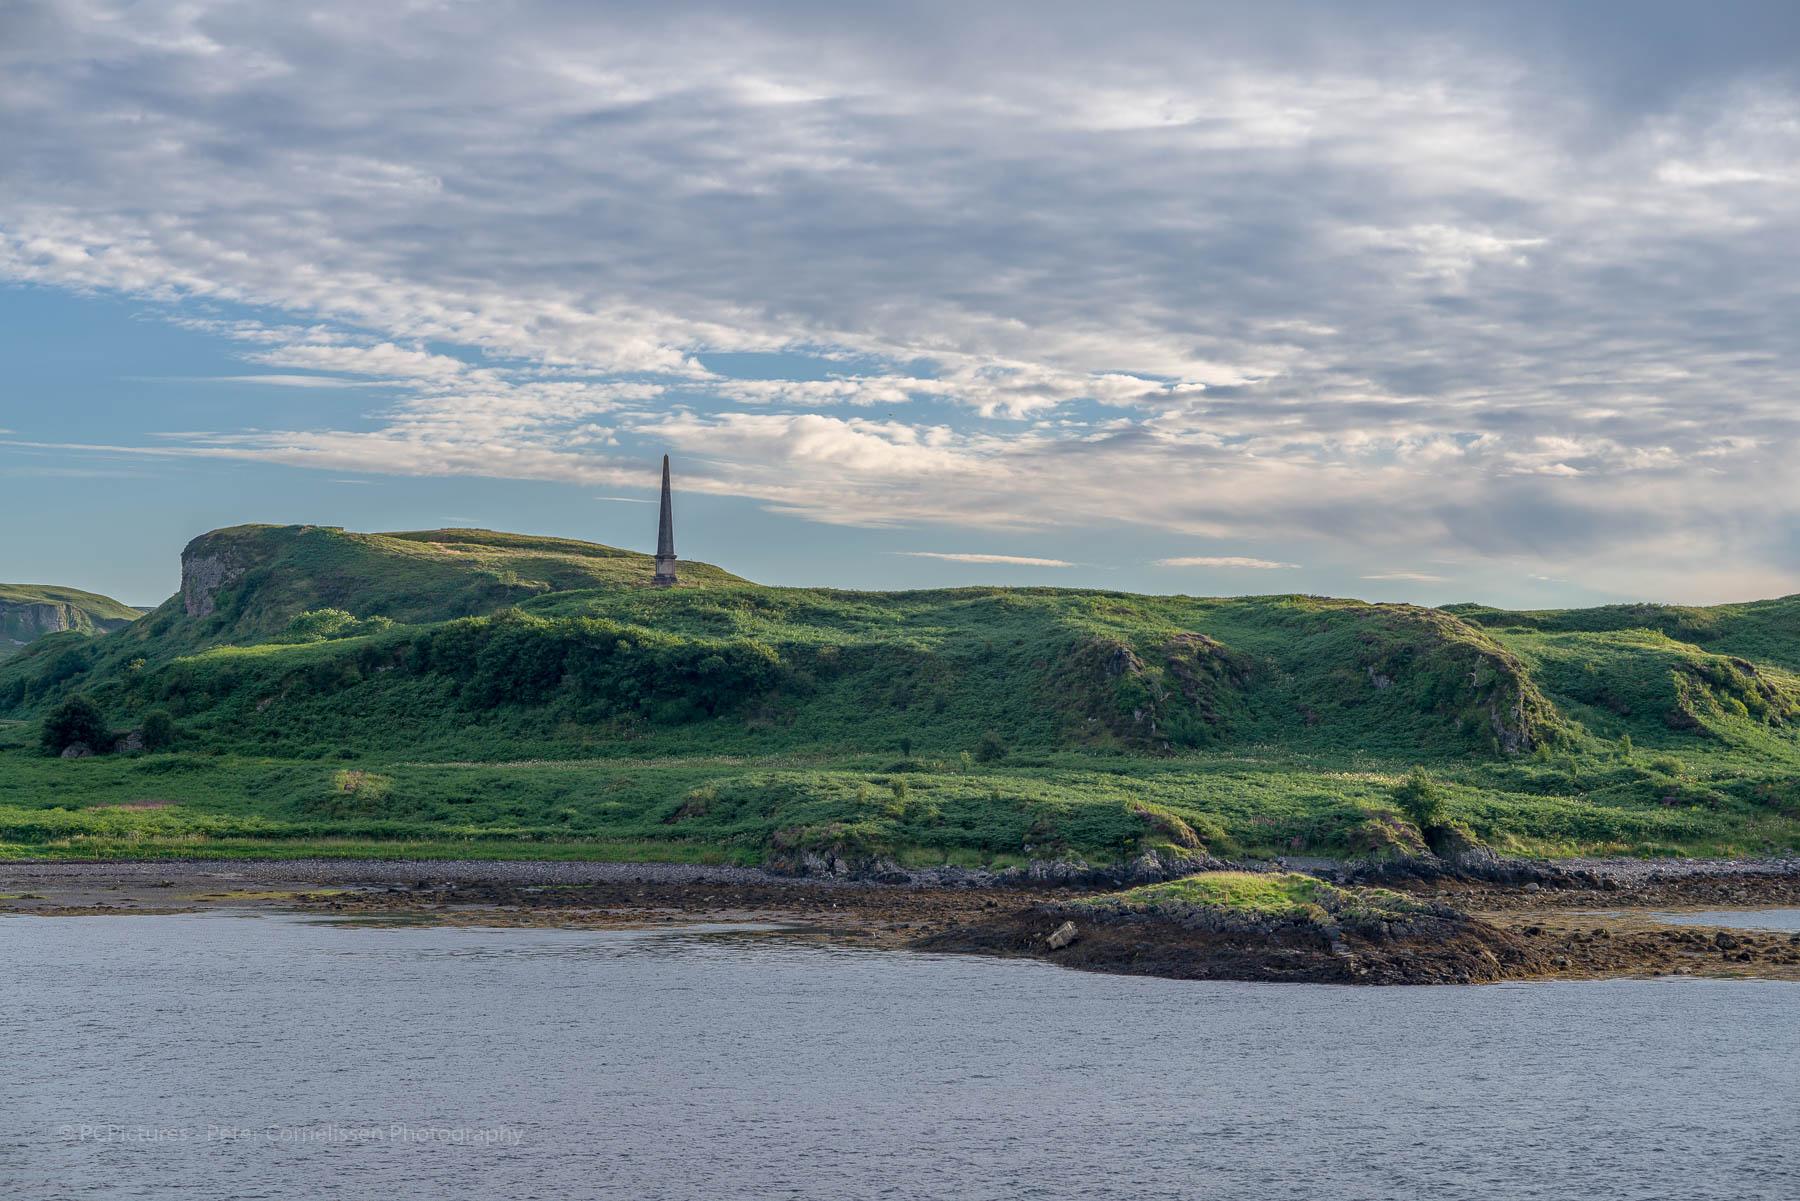 Schotland, seascapes, travel